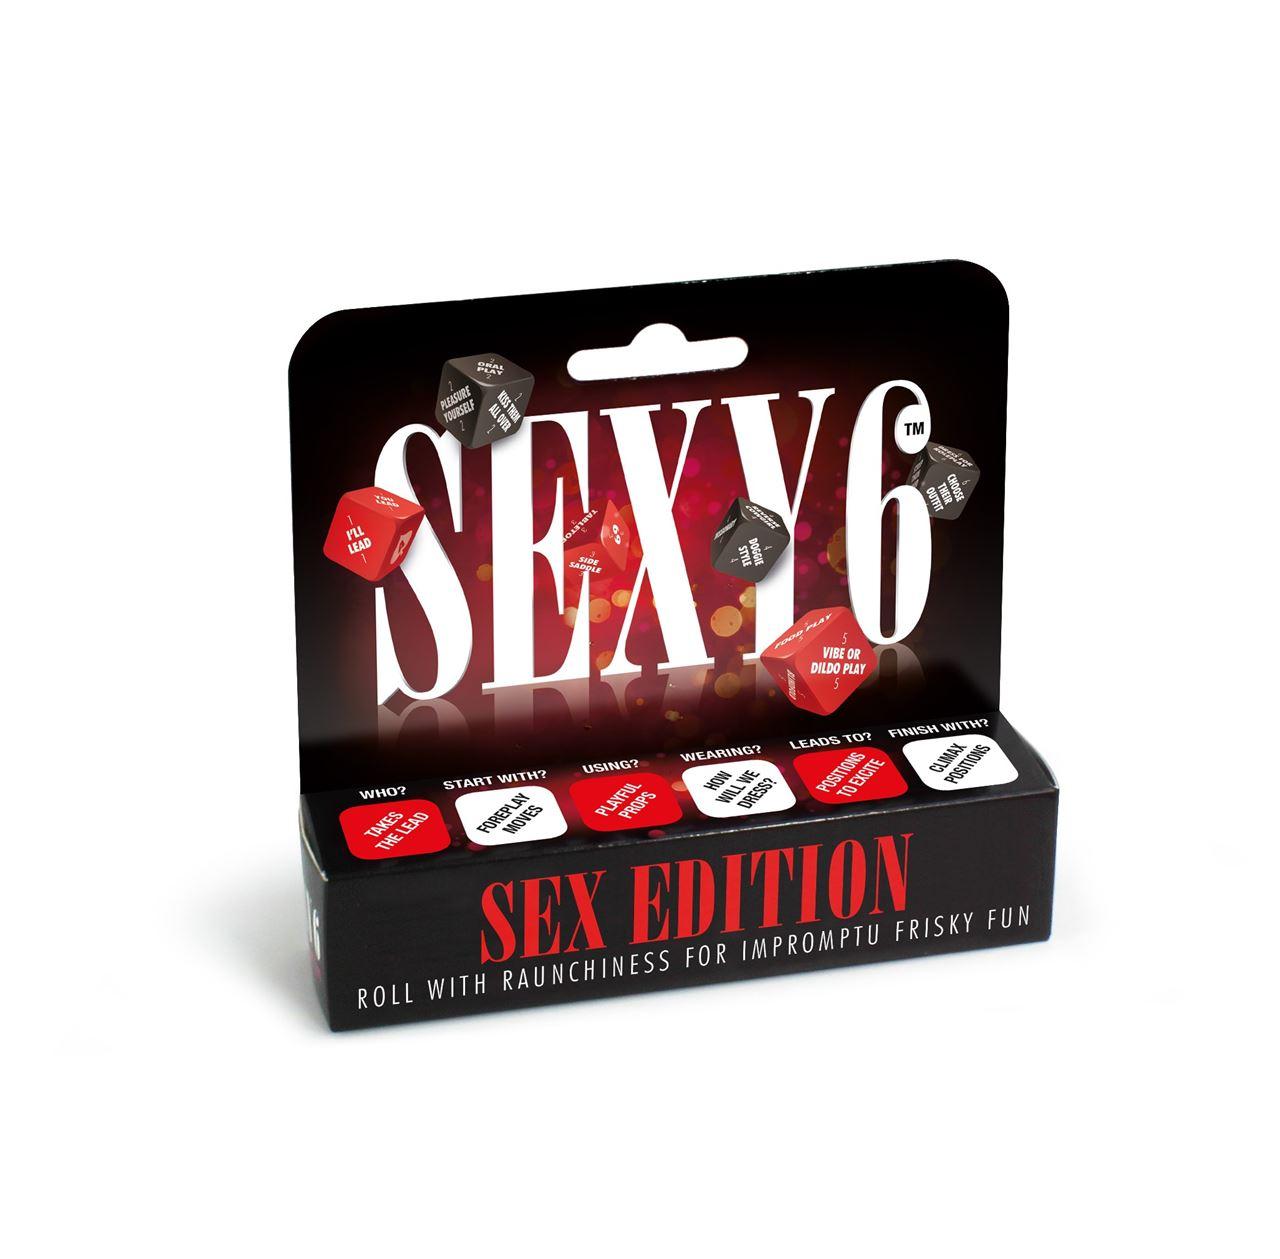 0019716_sexy-6-dice-sex-edition_ksykcwvspa1wsabk.jpeg